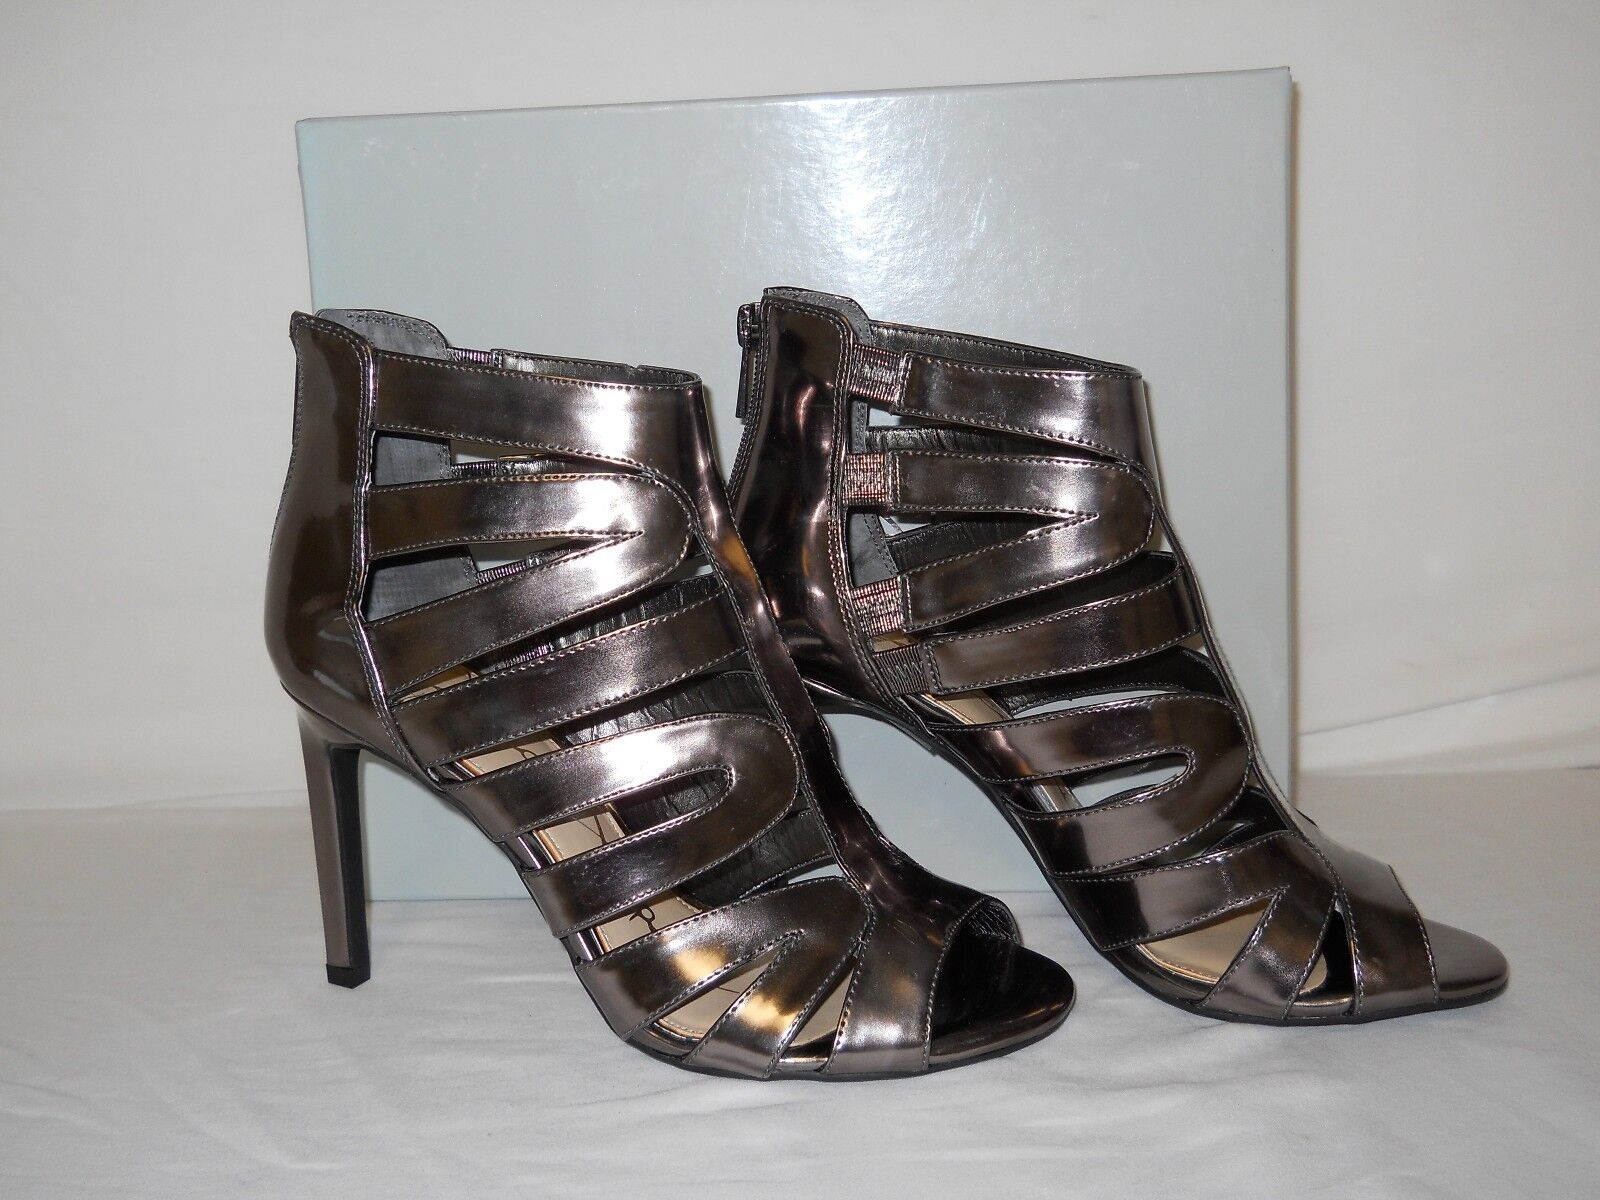 Jessica Simpson NEU Damenschuhe Careyy Gunmetal Caged Sandales 7 M Schuhes NWB